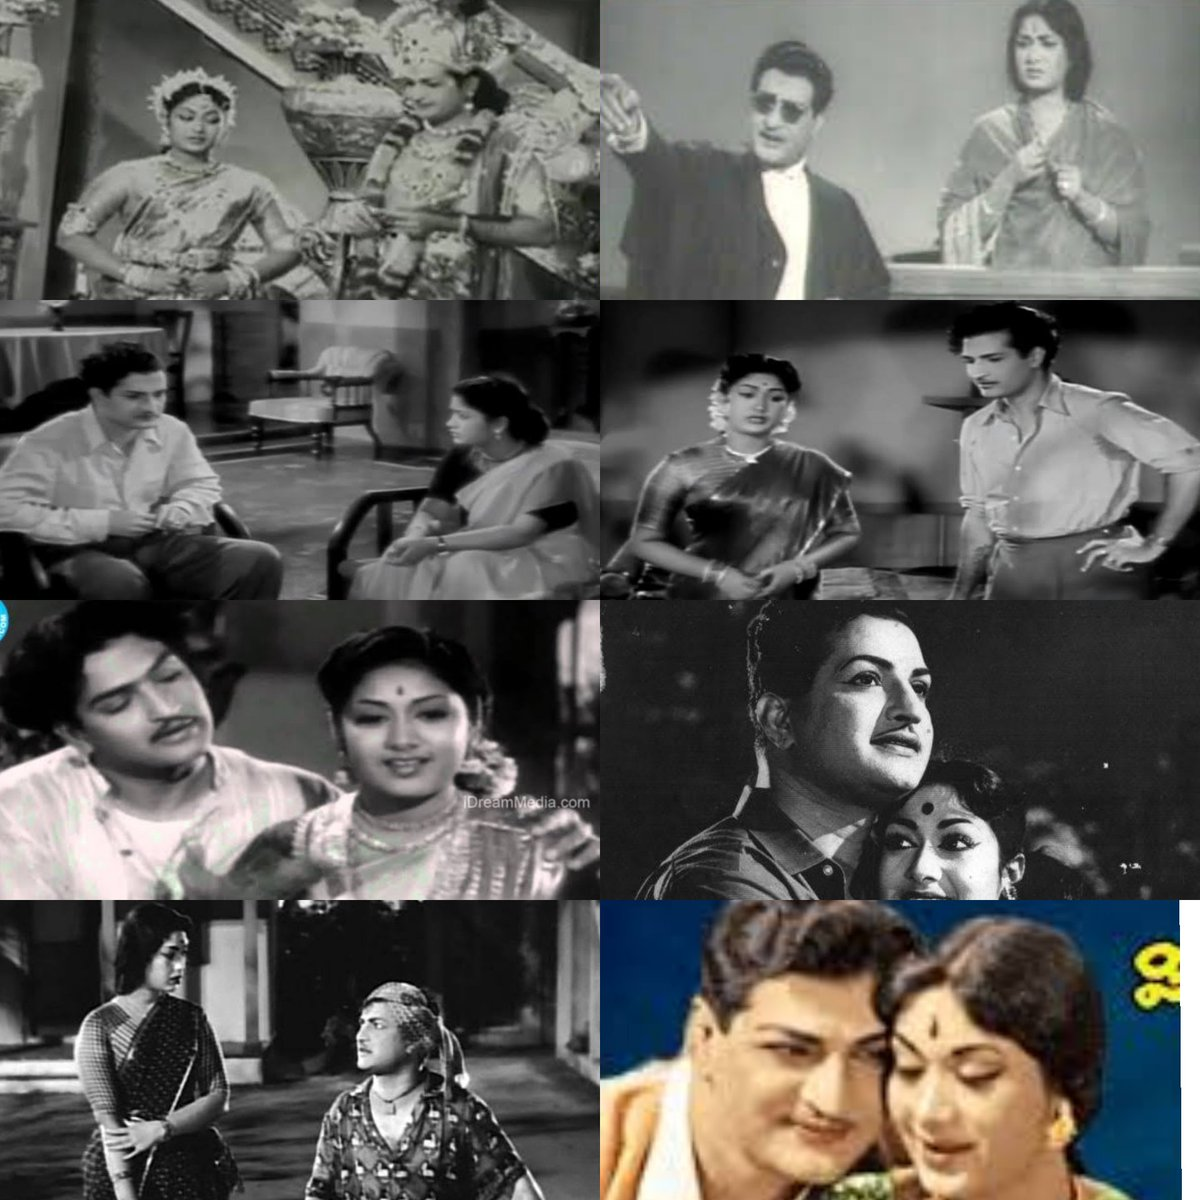 Mahanati Fans Remembering Lengend NTR on His Birth Anniversary   #NTRJayanthi  #HappyBirthdayNTR <br>http://pic.twitter.com/IKOXDry4WV